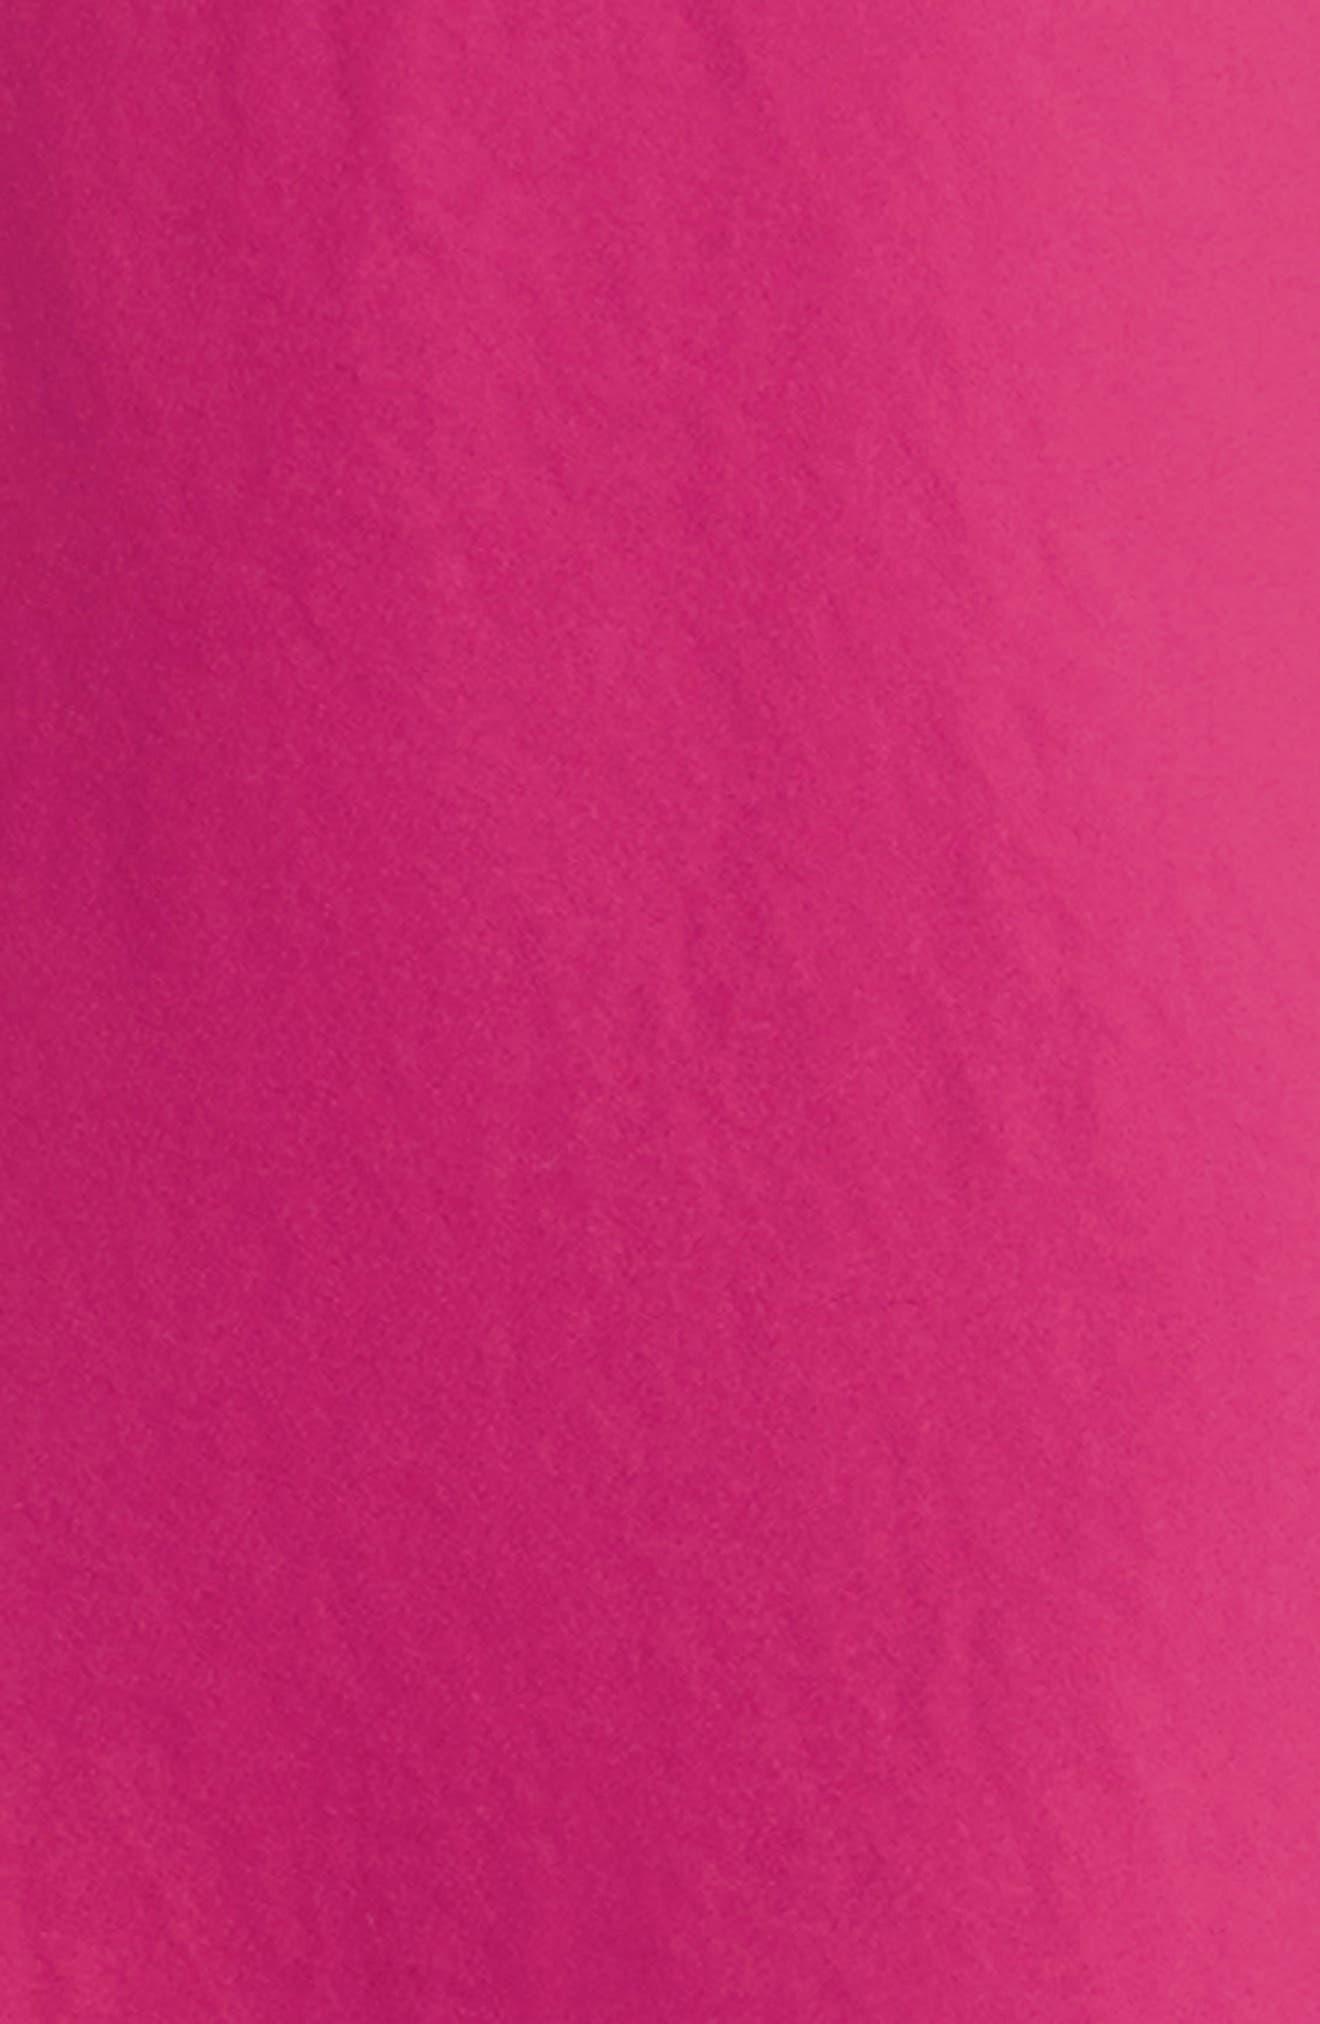 Hamlin Asymmetrical High/Low Dress,                             Alternate thumbnail 6, color,                             652